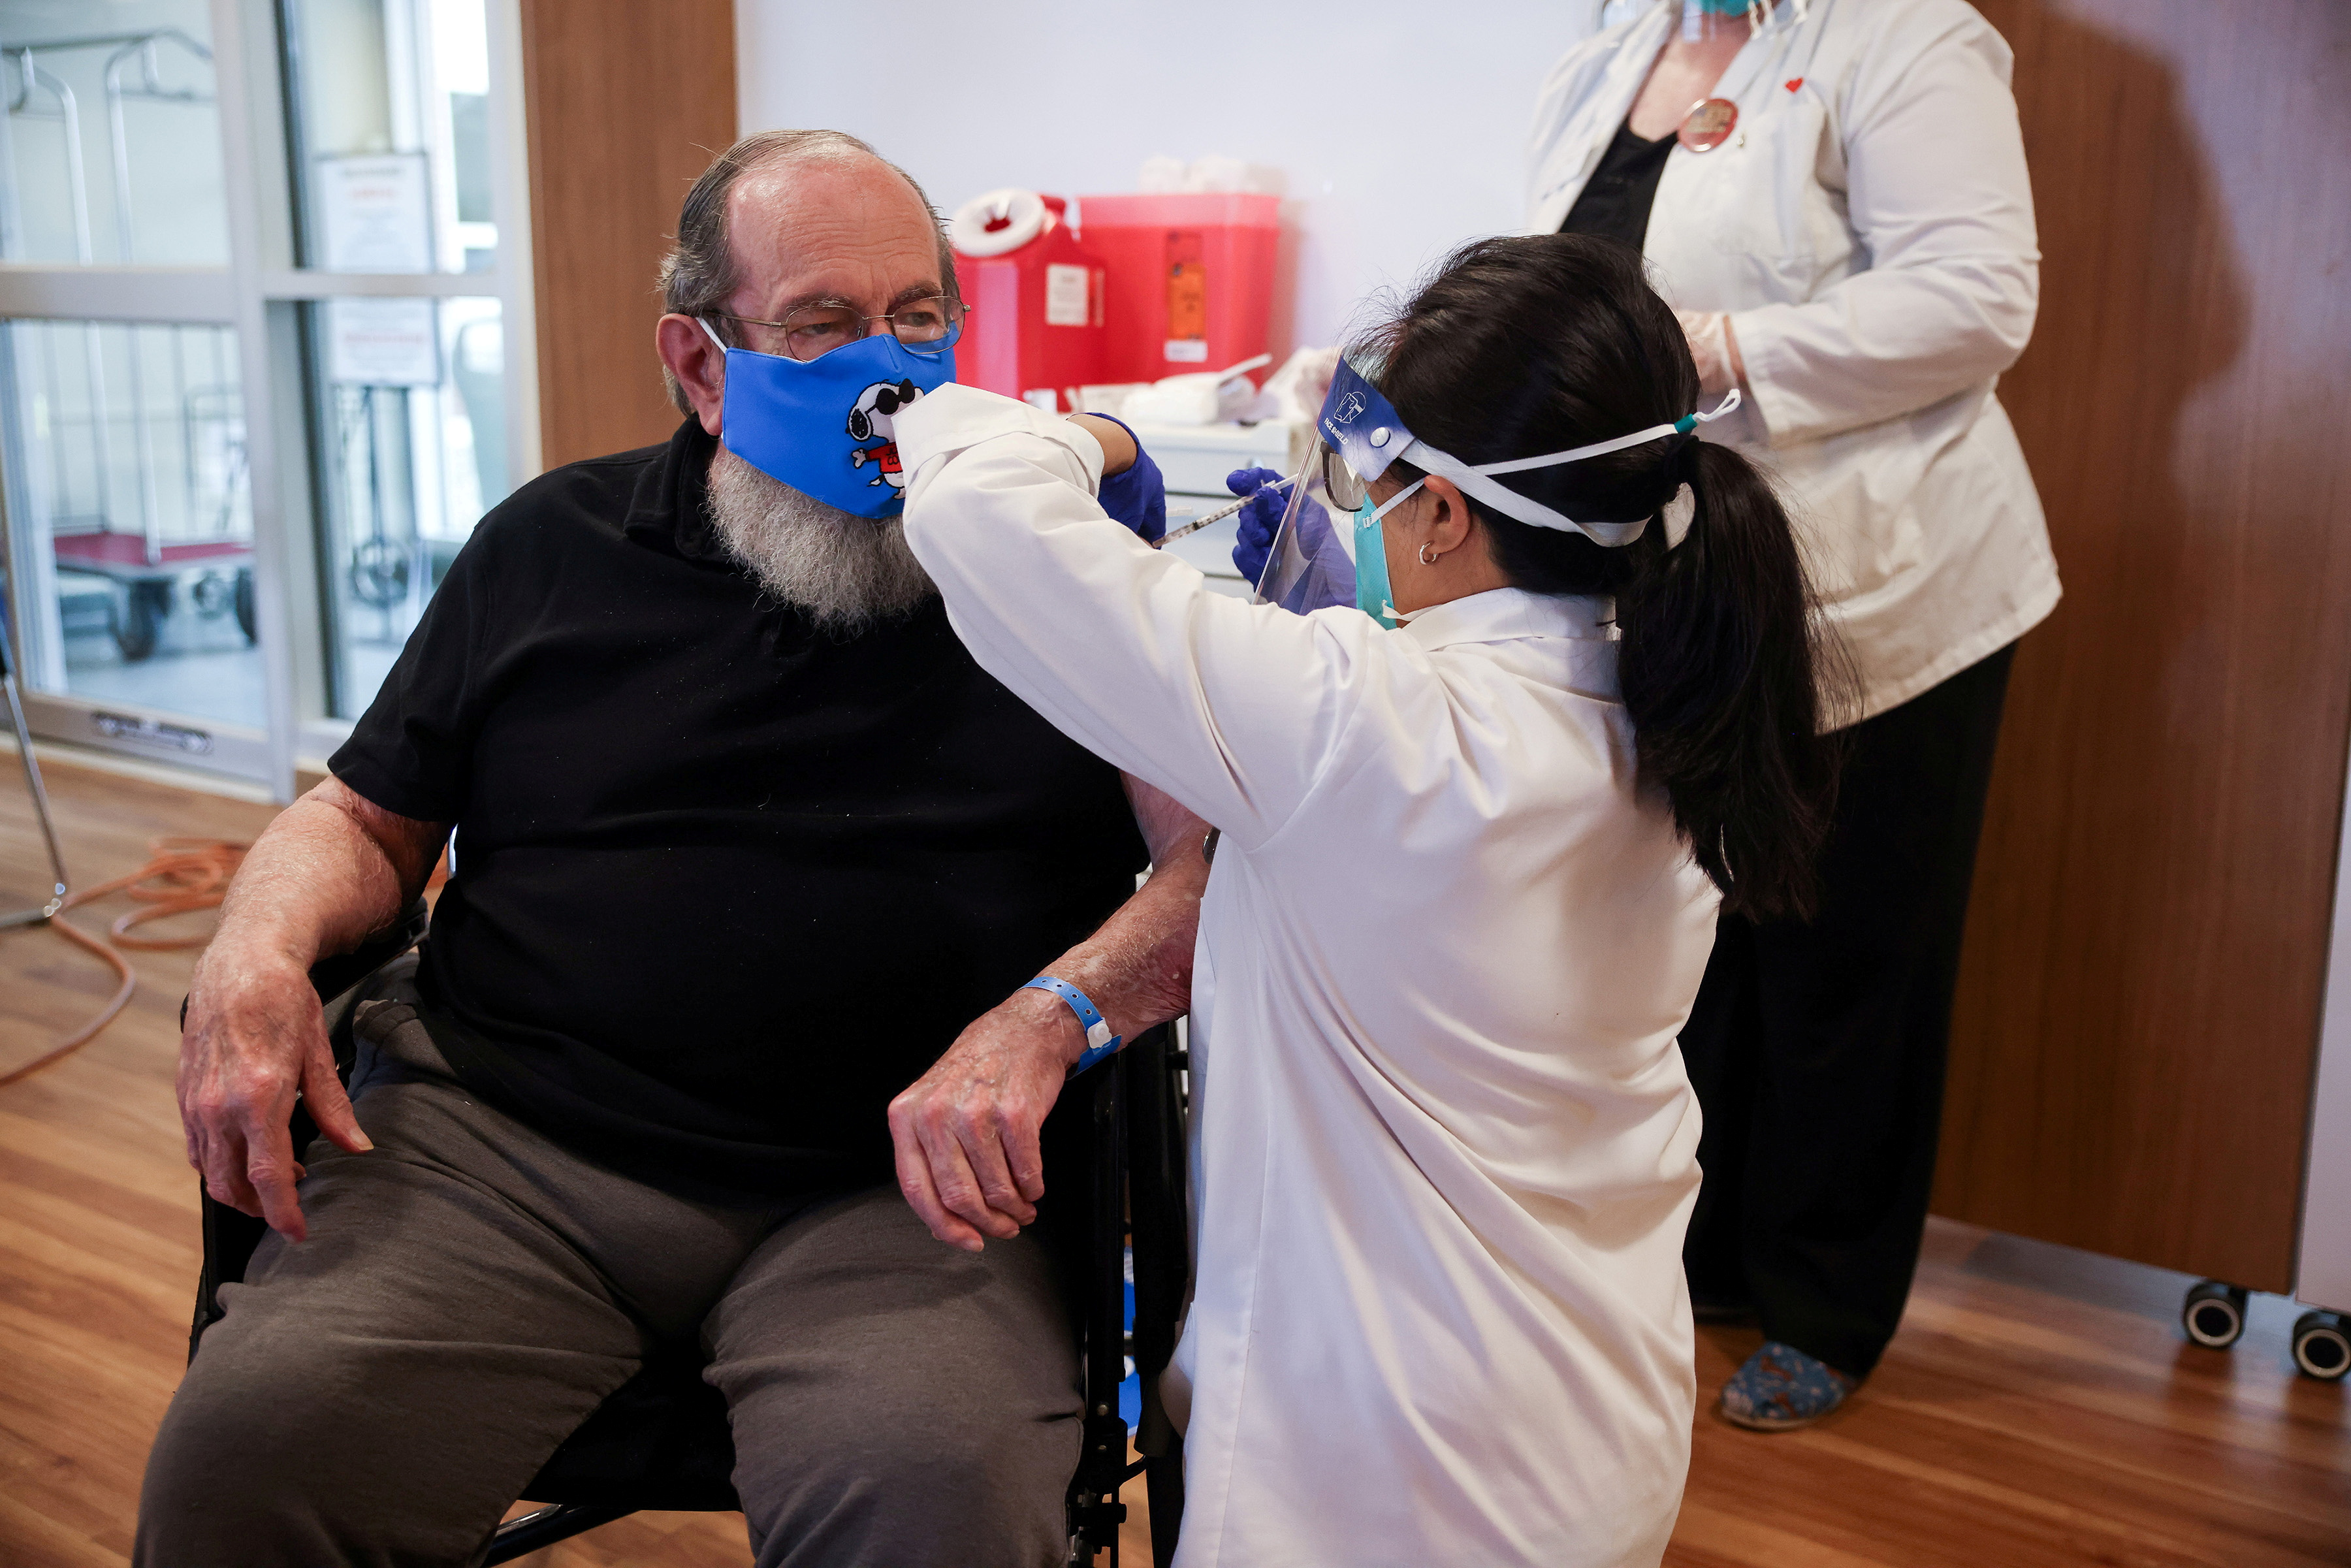 U.S. Air Force veteran Robert Aucoin, 78, receives a coronavirus disease (COVID-19) vaccine dose at the Soldiers' Home in Holyoke, Massachusetts, U.S. December 29, 2020. Hoang 'Leon' Nguyen/The Republican/Pool via REUTERS